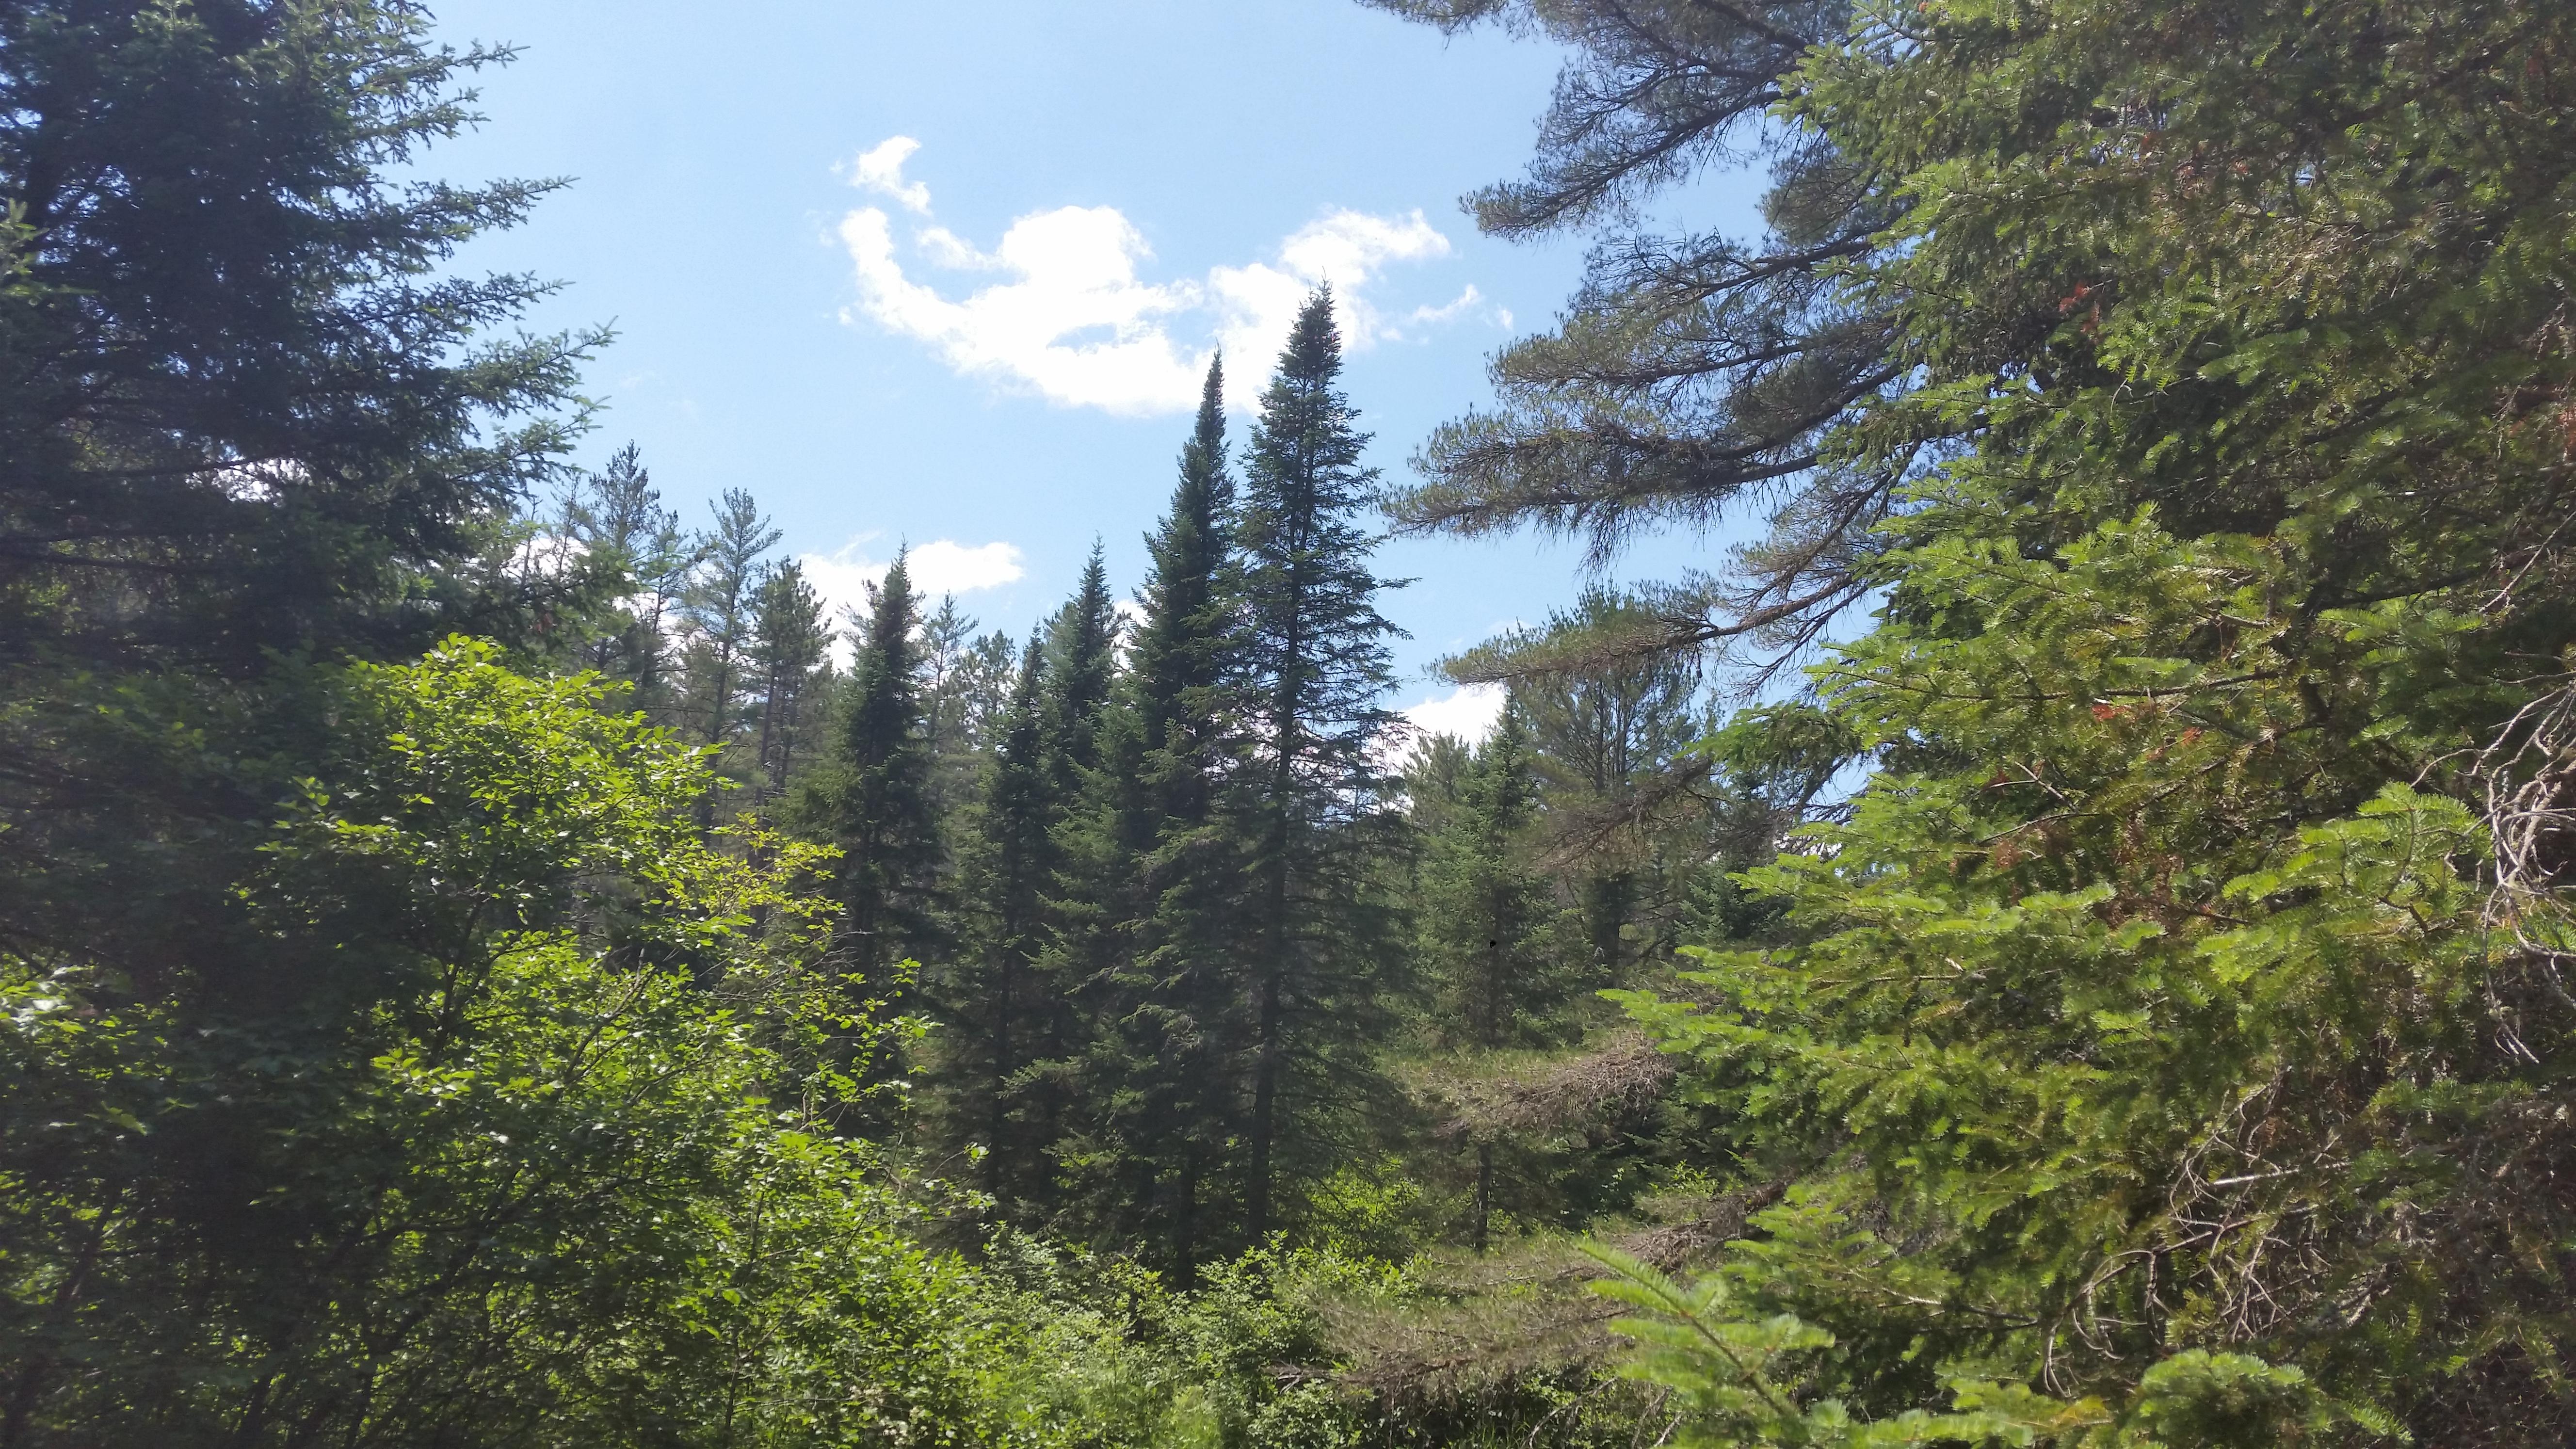 pine trees and sky